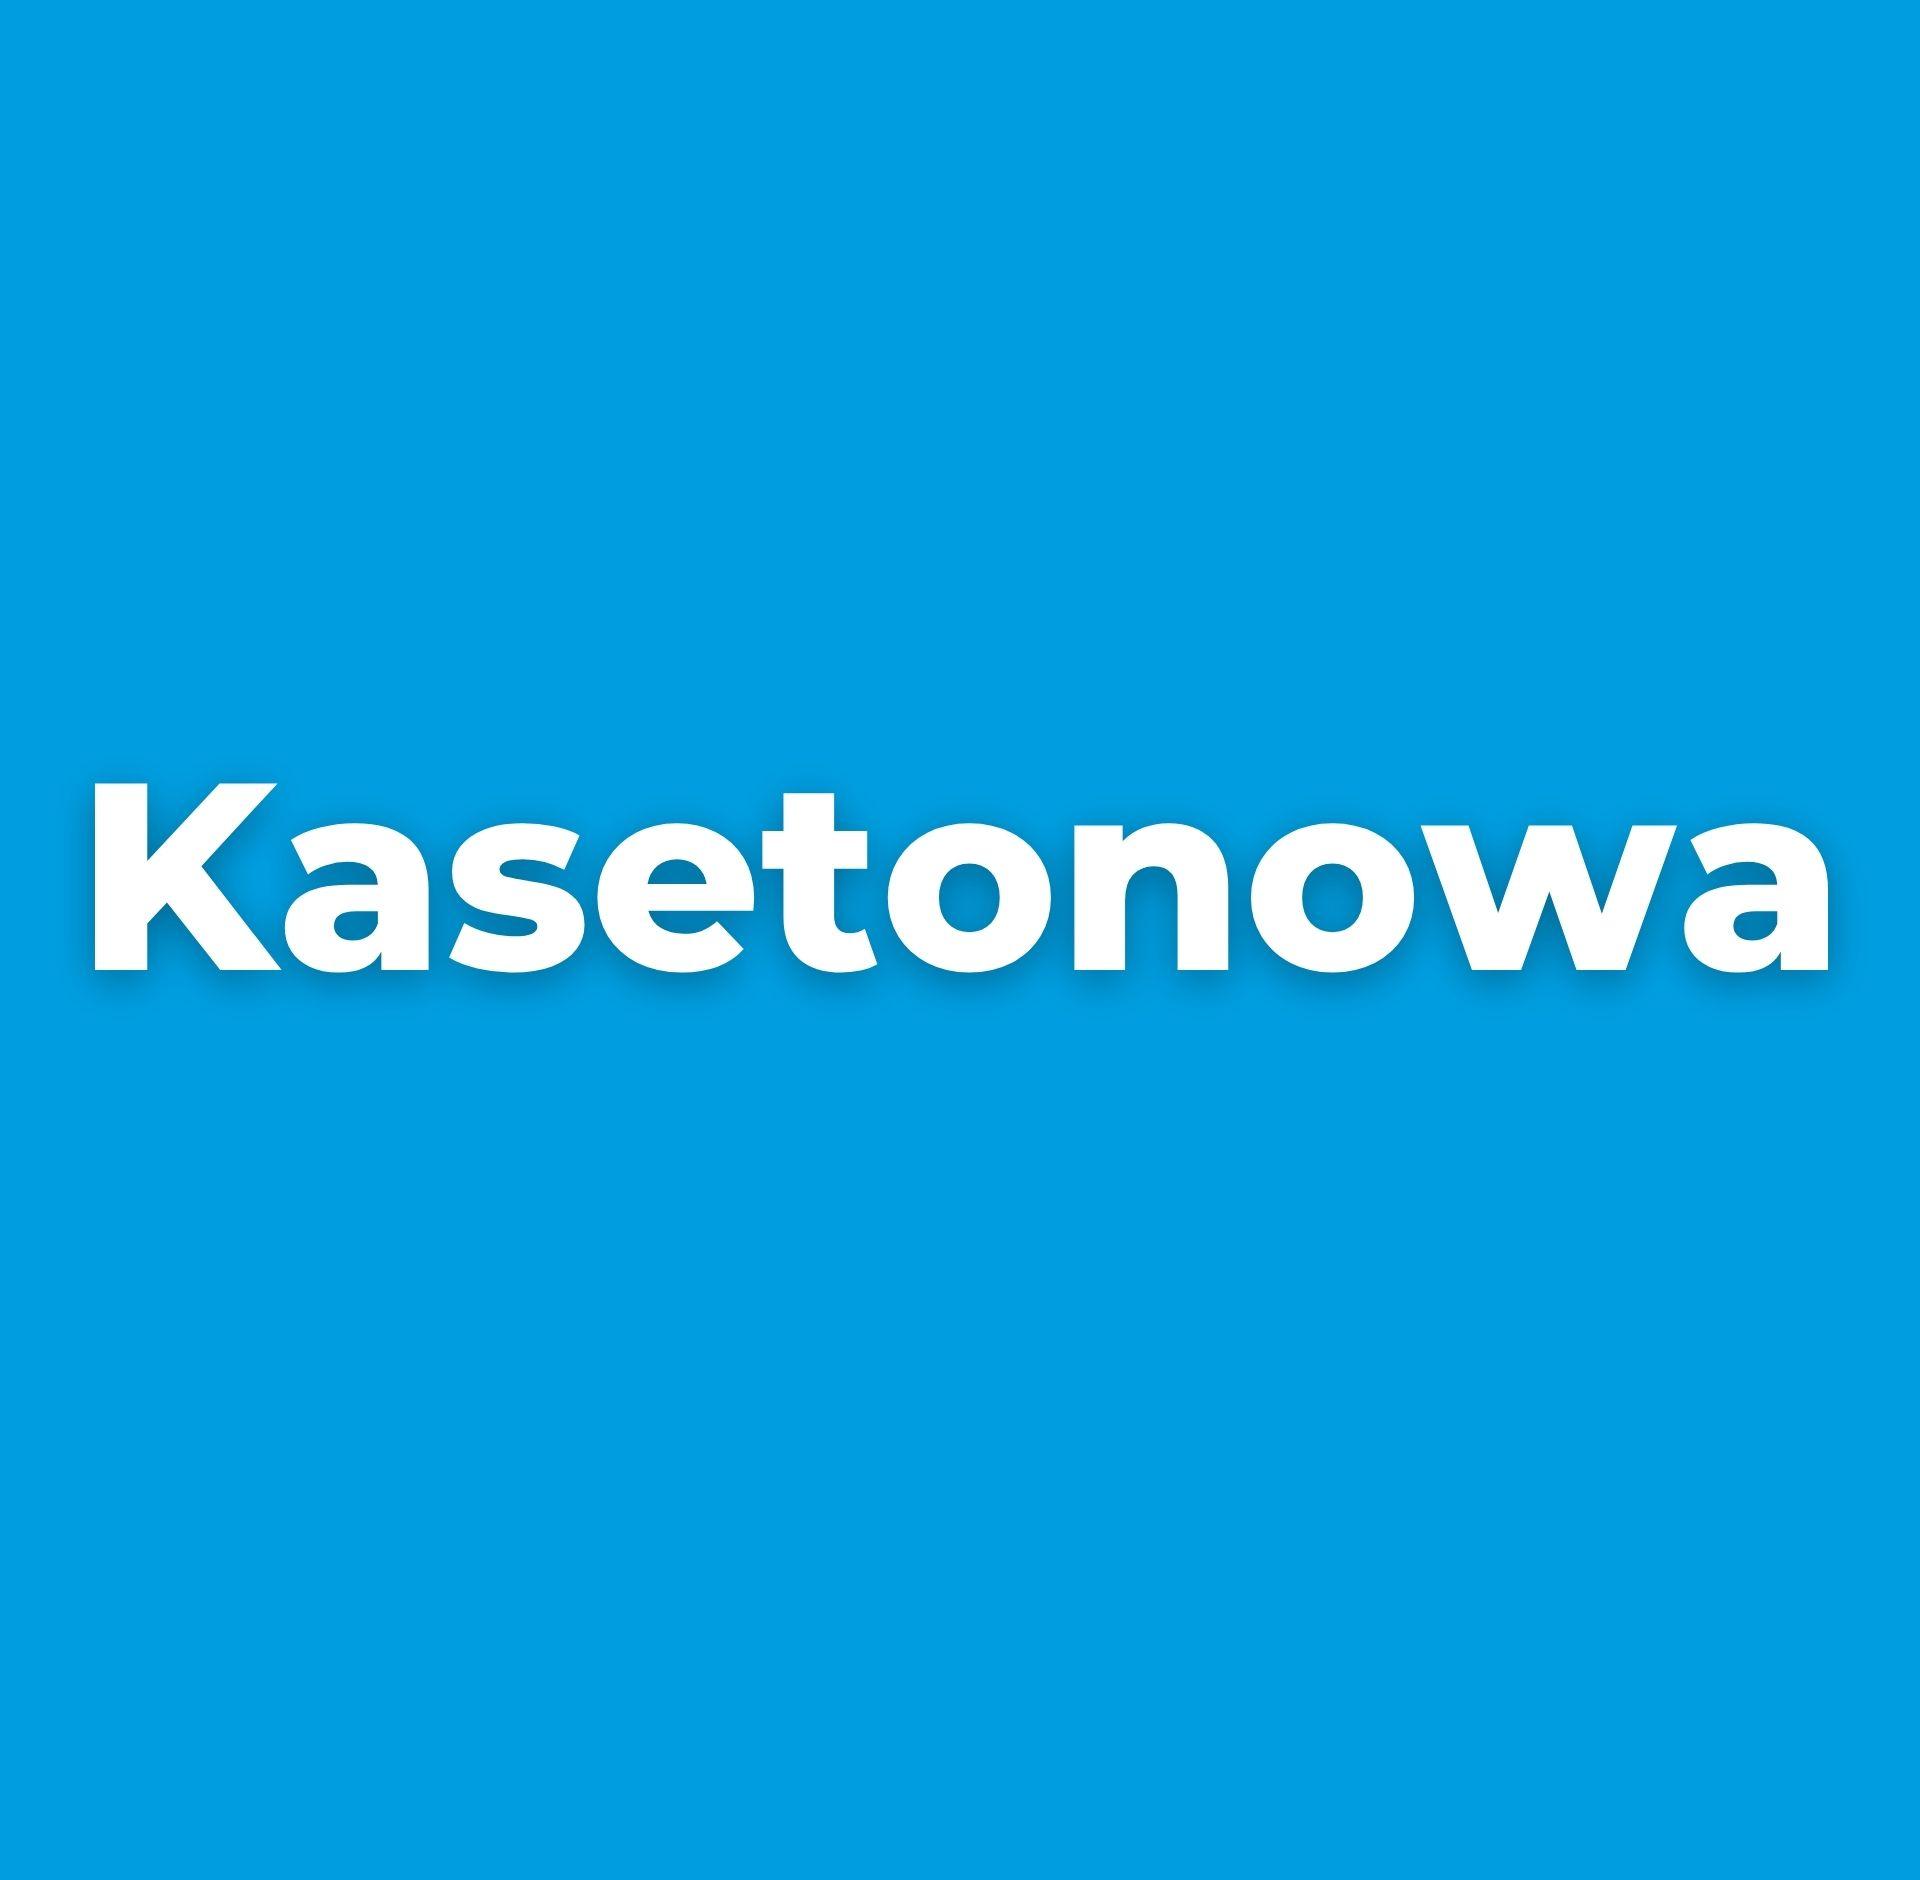 Kasetonowa